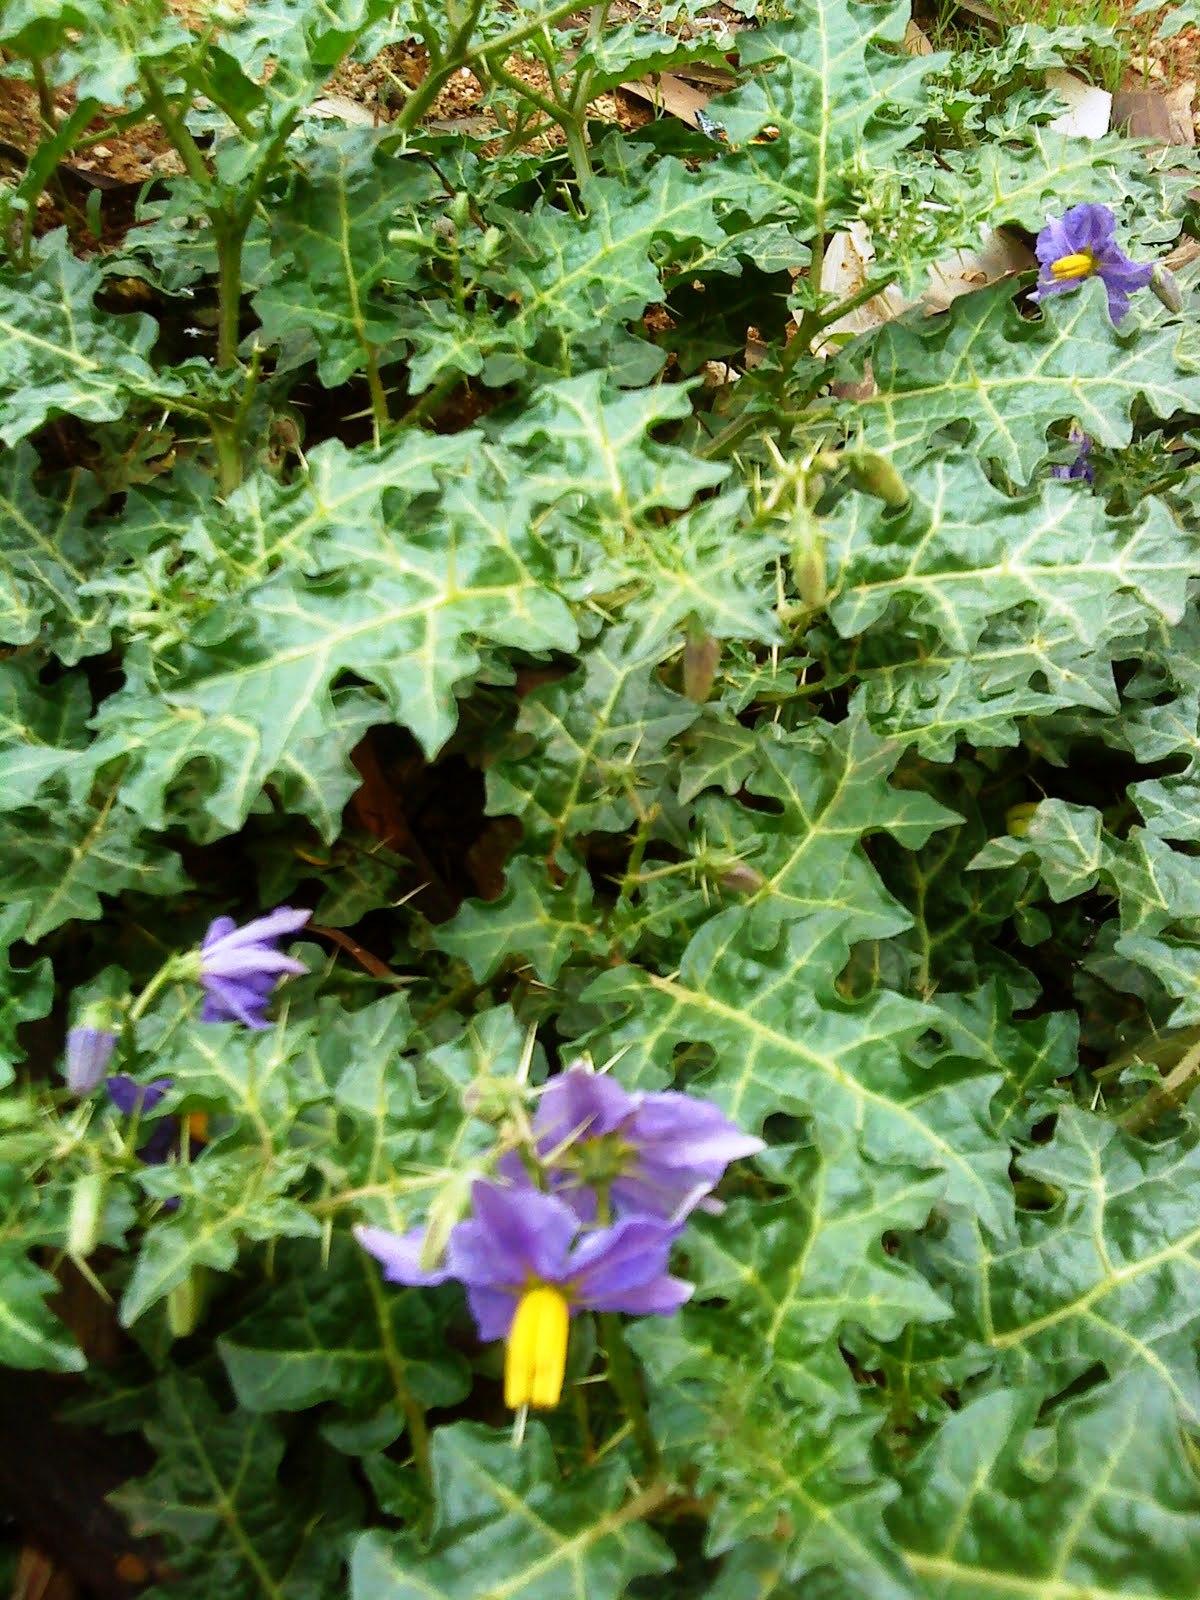 http://3.bp.blogspot.com/_bBqysXGhPys/TG1xO2OA0OI/AAAAAAAACGI/HMXo0EW7gJw/s1600/Solanum+virginianum1.JPG